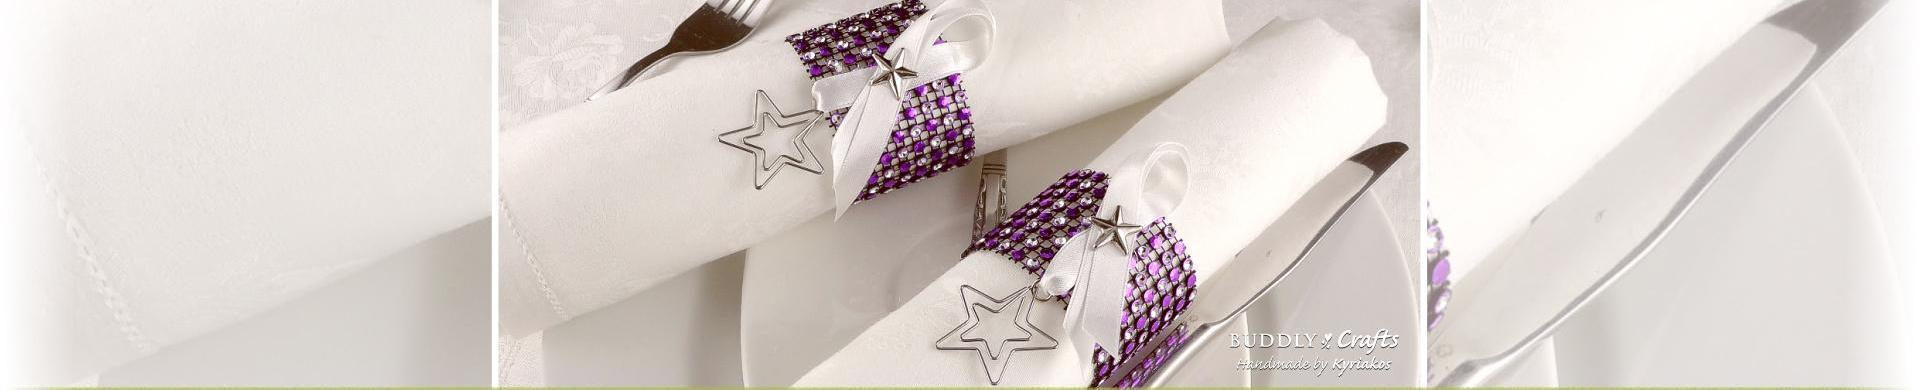 Sparkly Rhinestone Napkin Rings